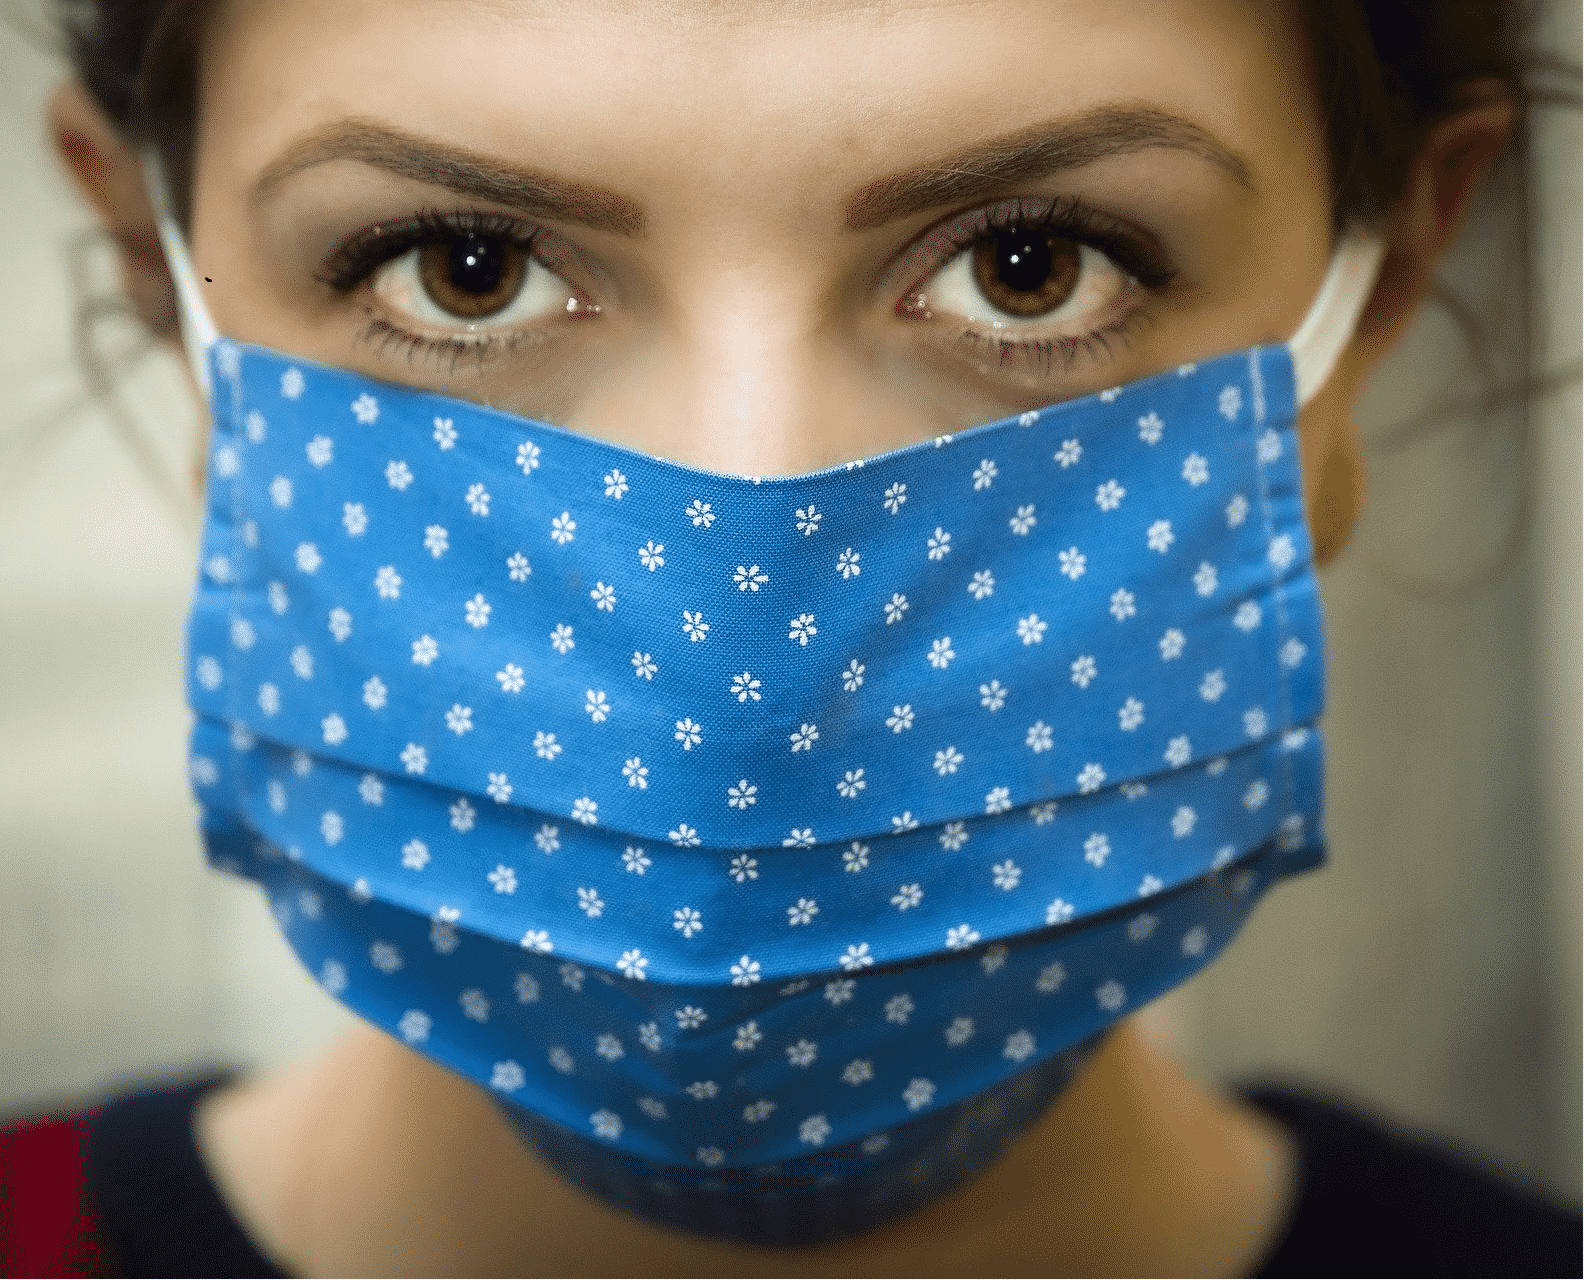 Gesichtsmaske Behelfs-Mund-Nasen-Maske OG 100% Baumwolle